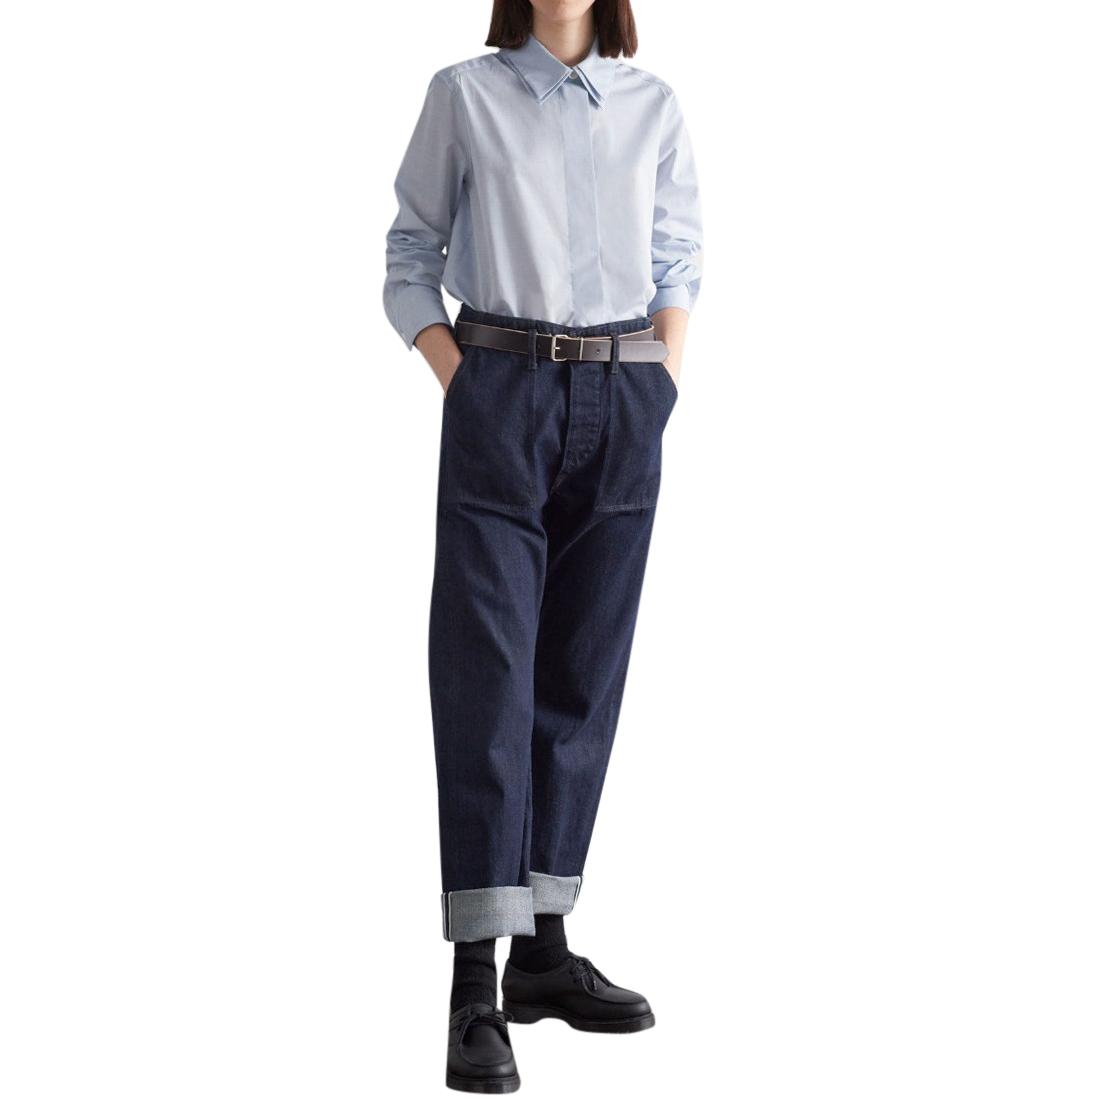 MHL by Margaret Howell Denim Worker Jeans